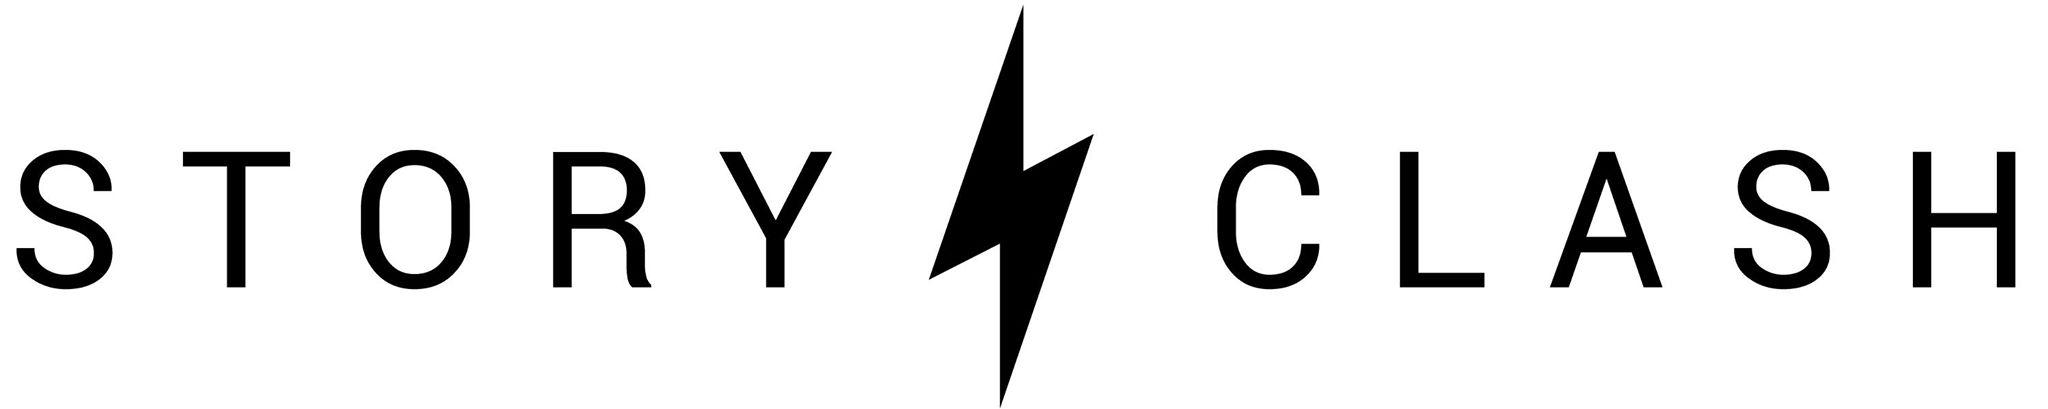 Storyclash Logo